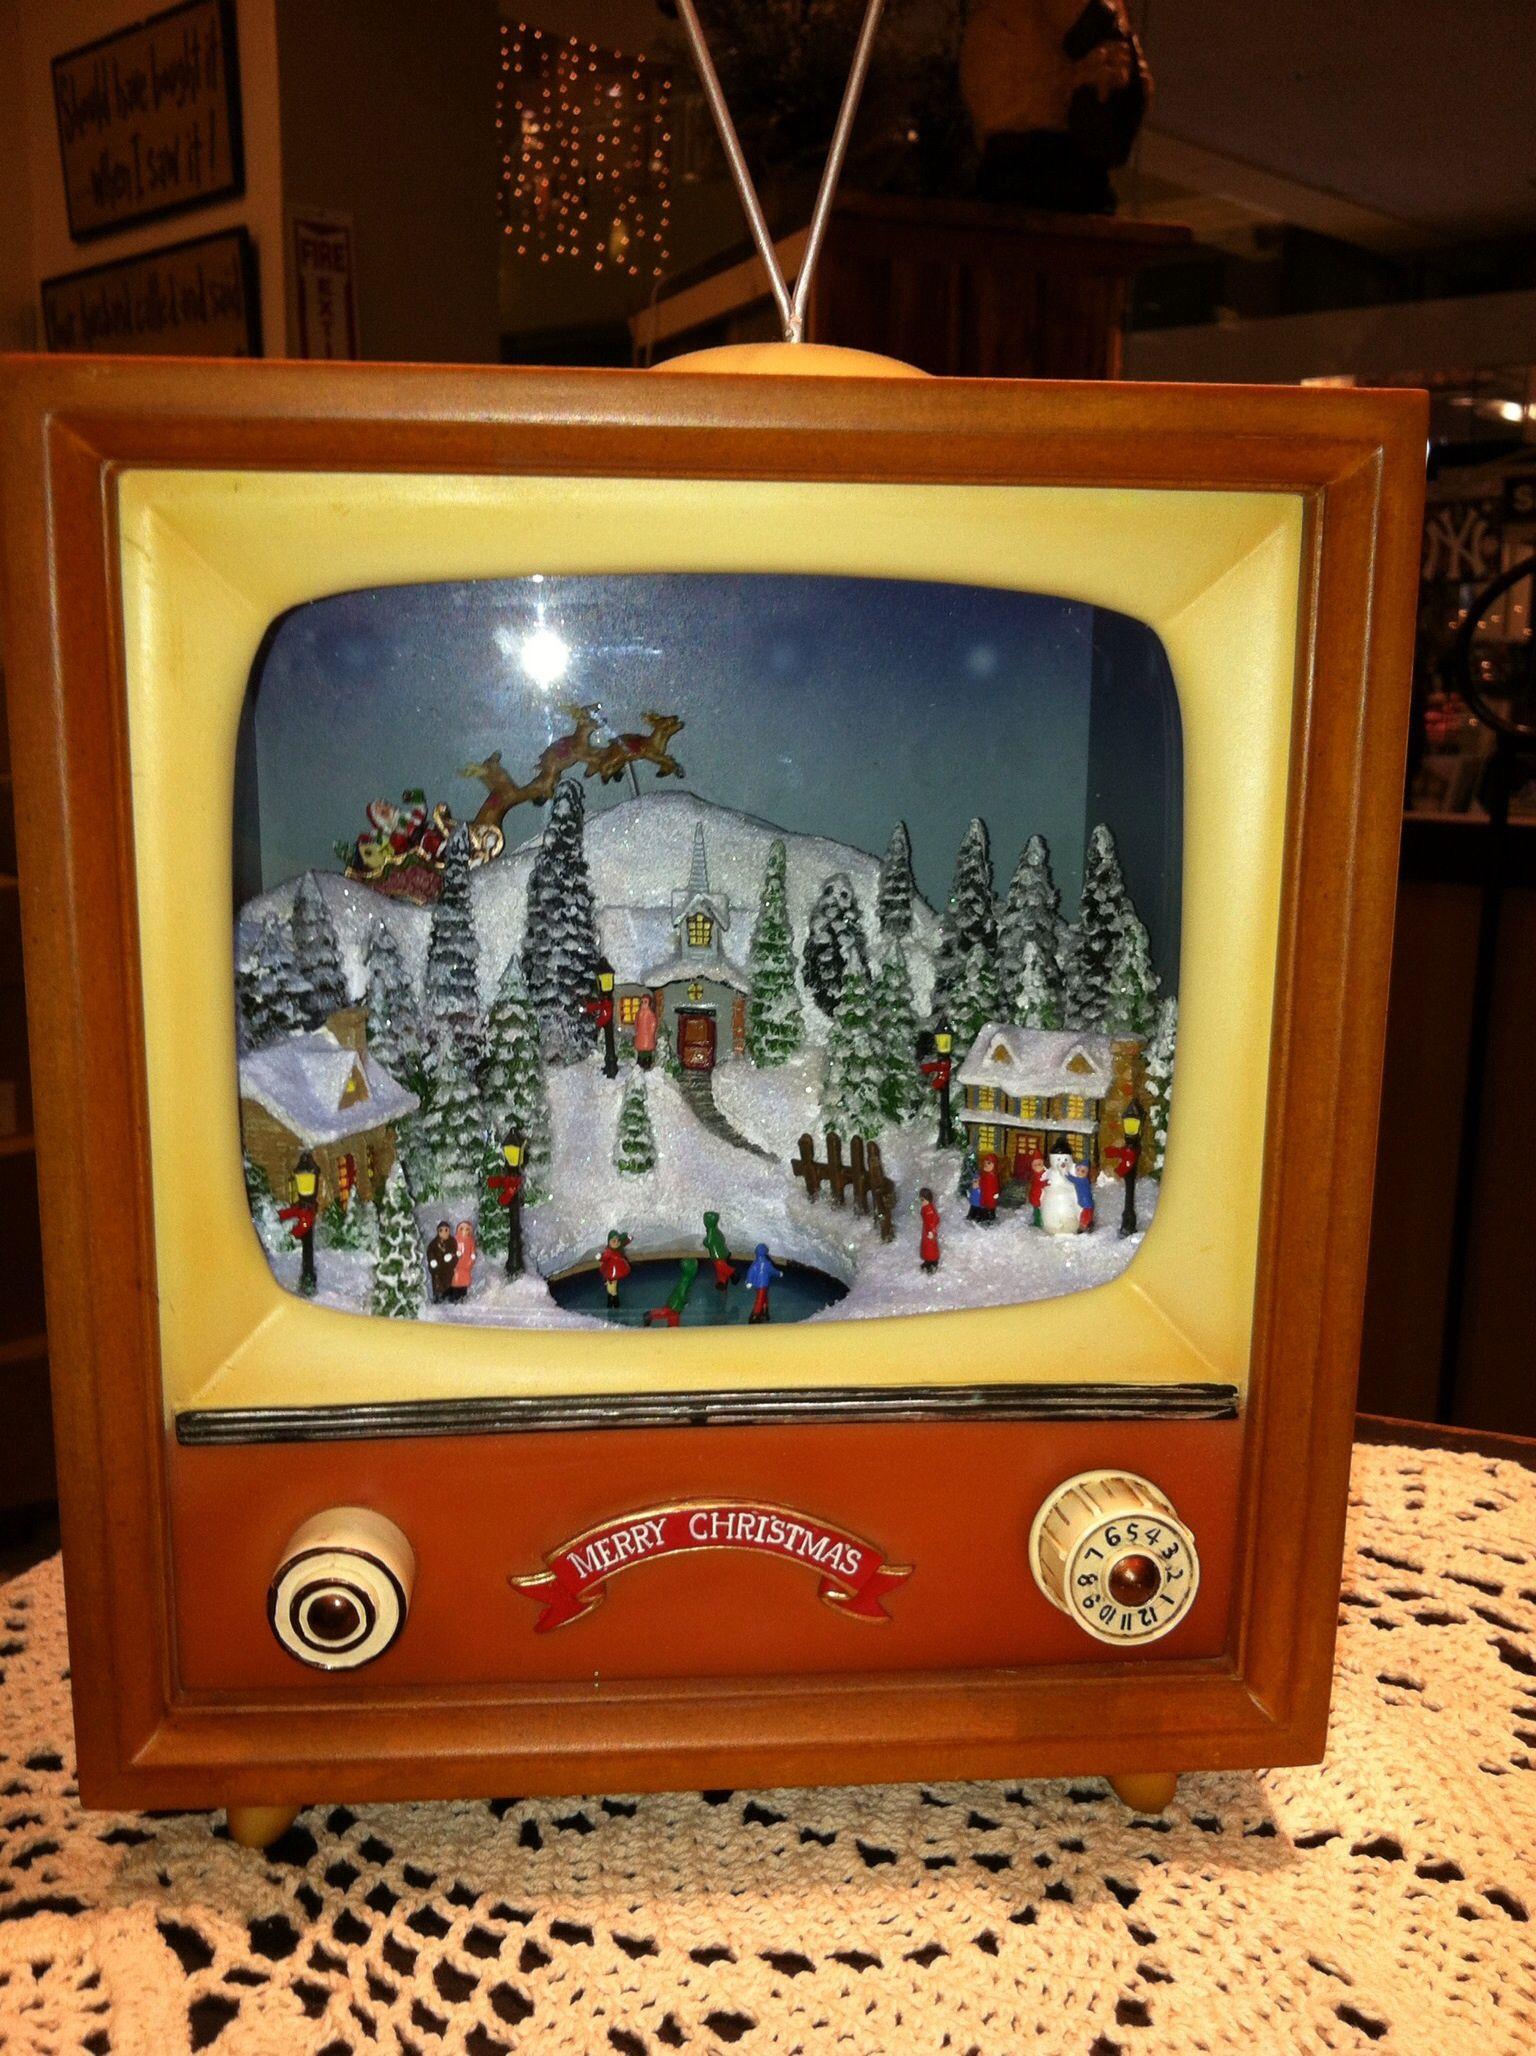 Vintage Tv Christmas Snow Scene Music Box Christmas Diorama Holiday Decor Christmas Christmas Scene